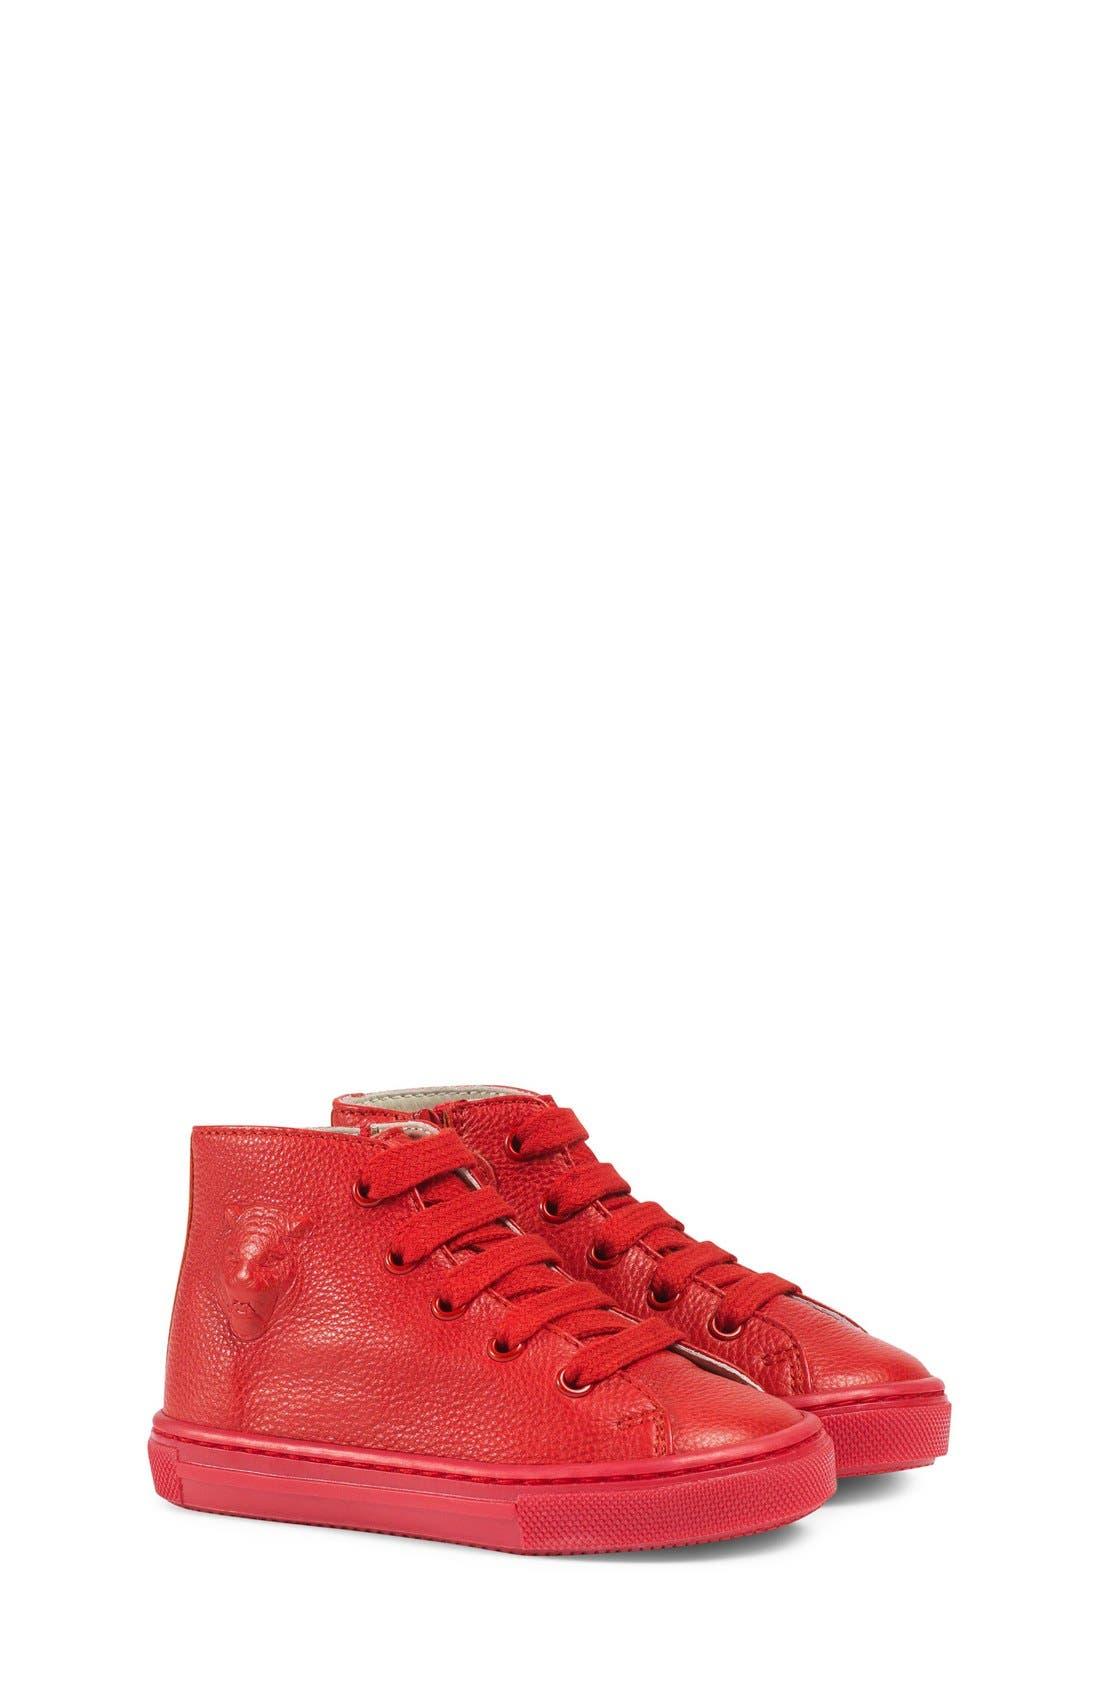 Gucci Major High Top Sneaker (Baby, Walker, Toddler & Little Kid)